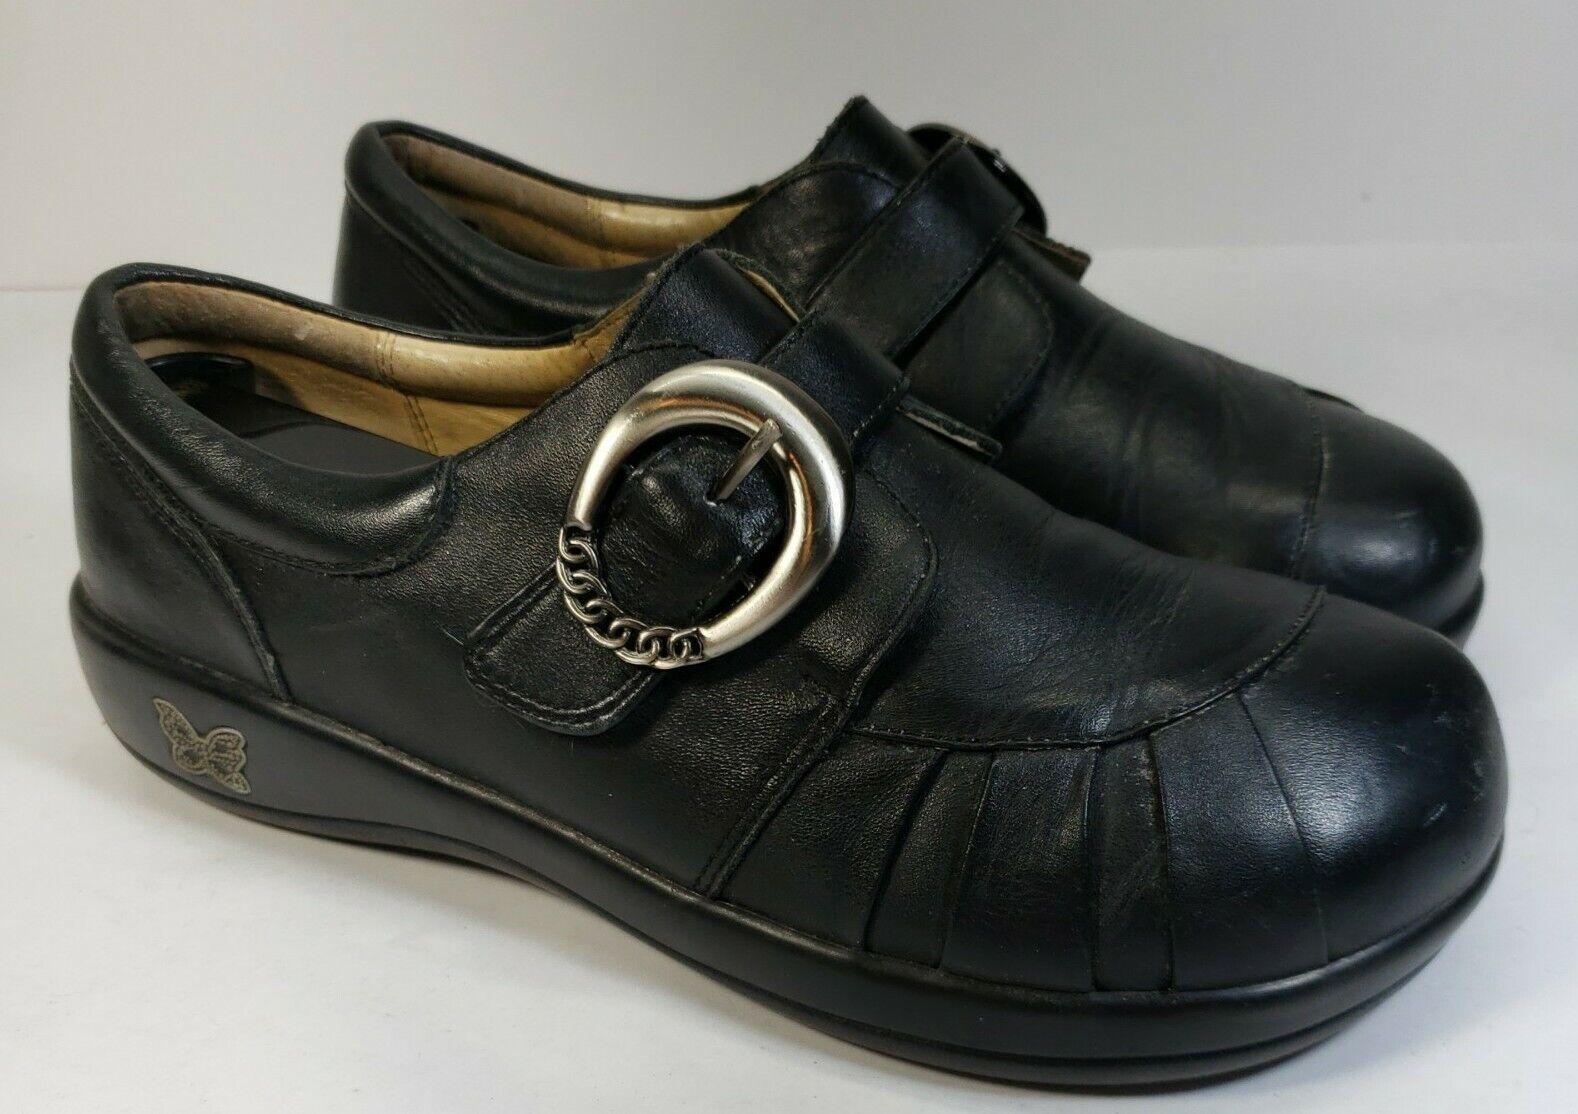 ALEGRIA 'Khloe' Black Leather Buckle Strap Comfort Shoes EUR 38